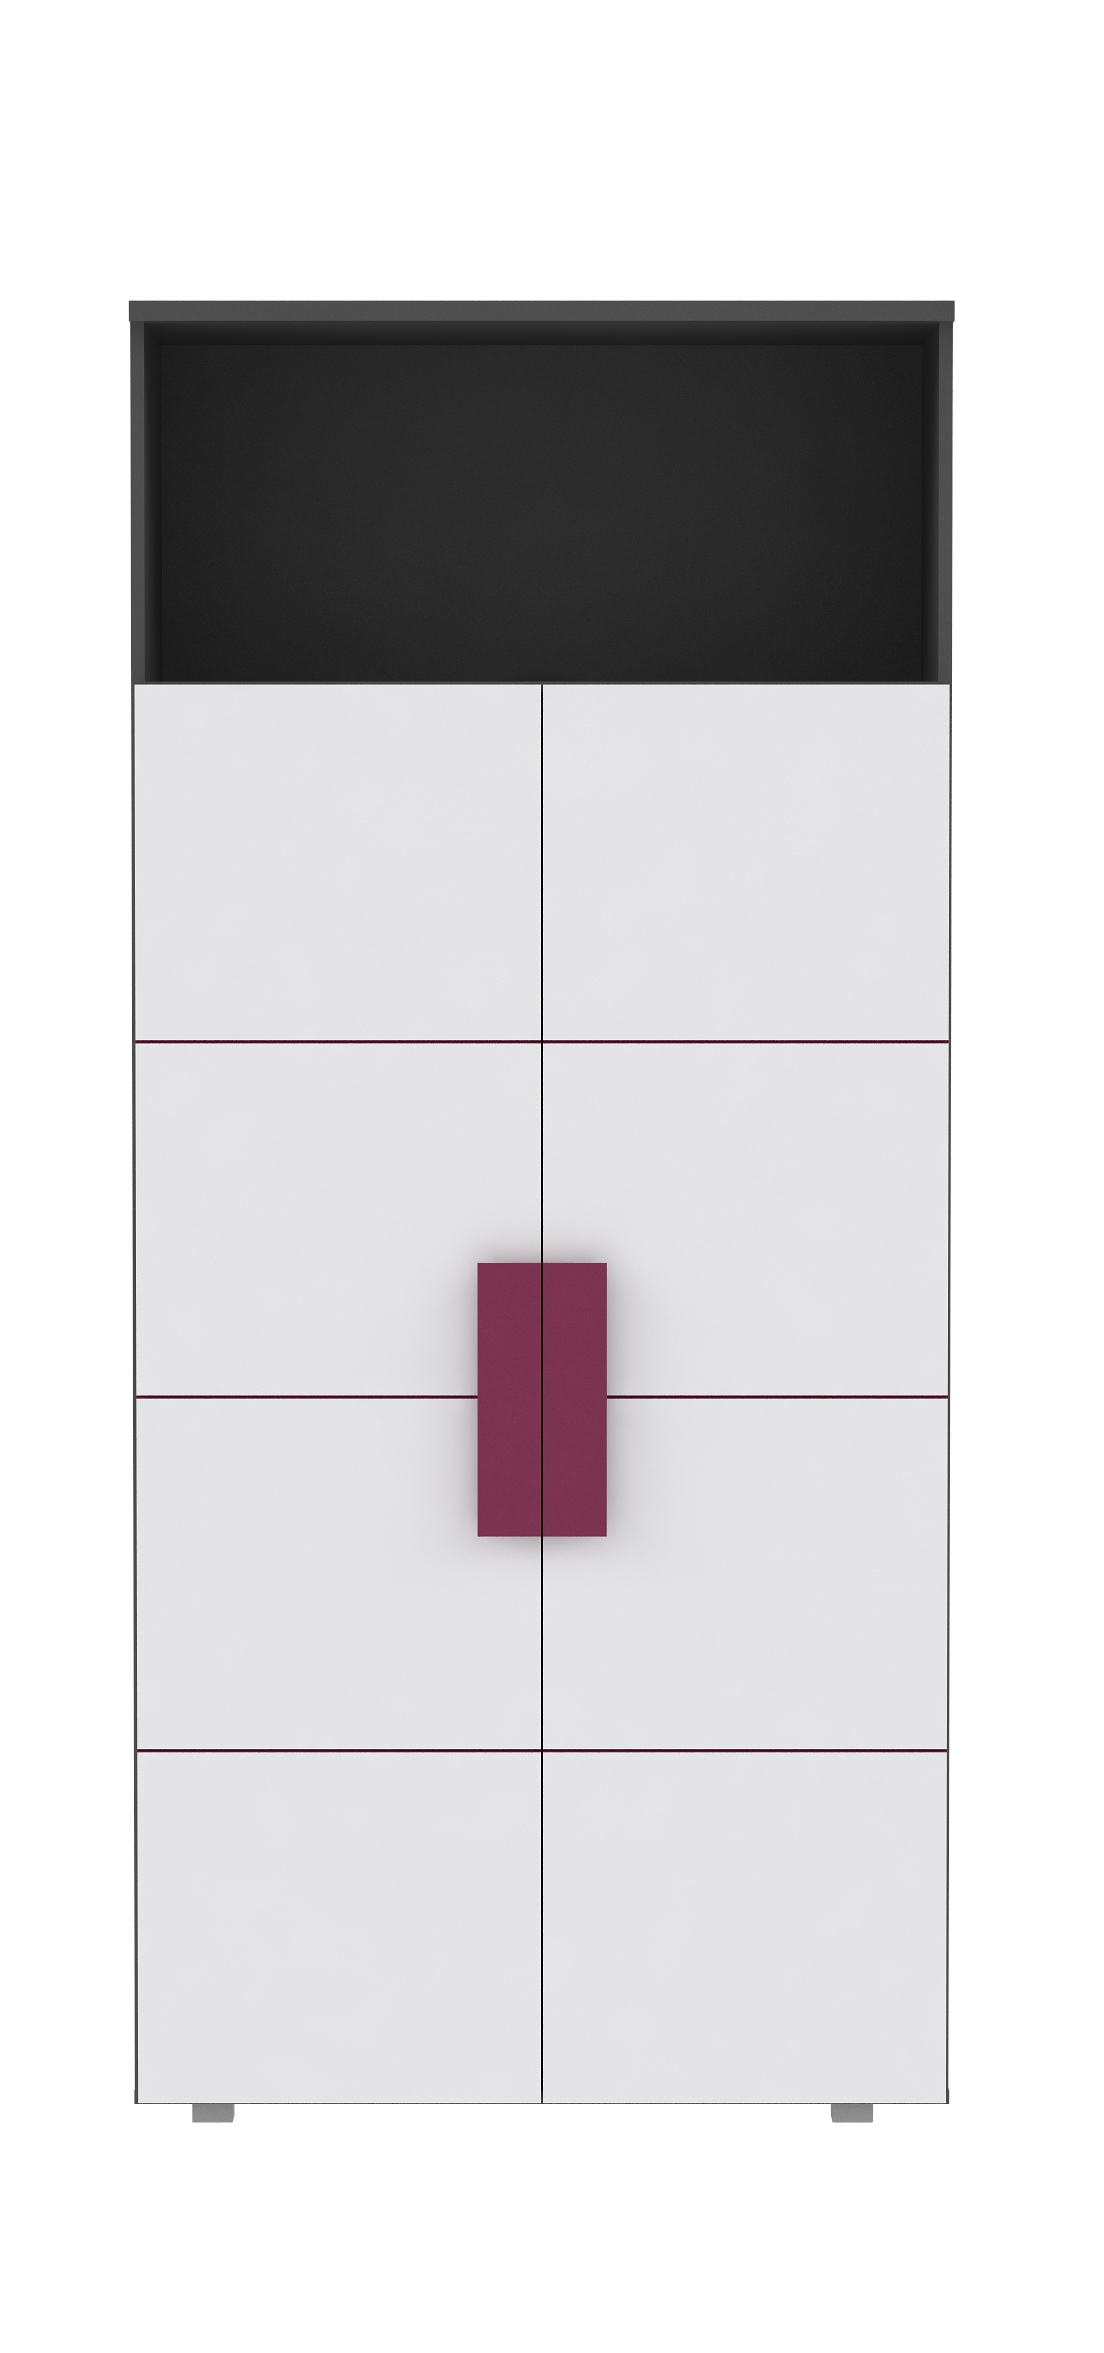 Jugendzimmer Weiß Grau Violett Trinity 8-teilig